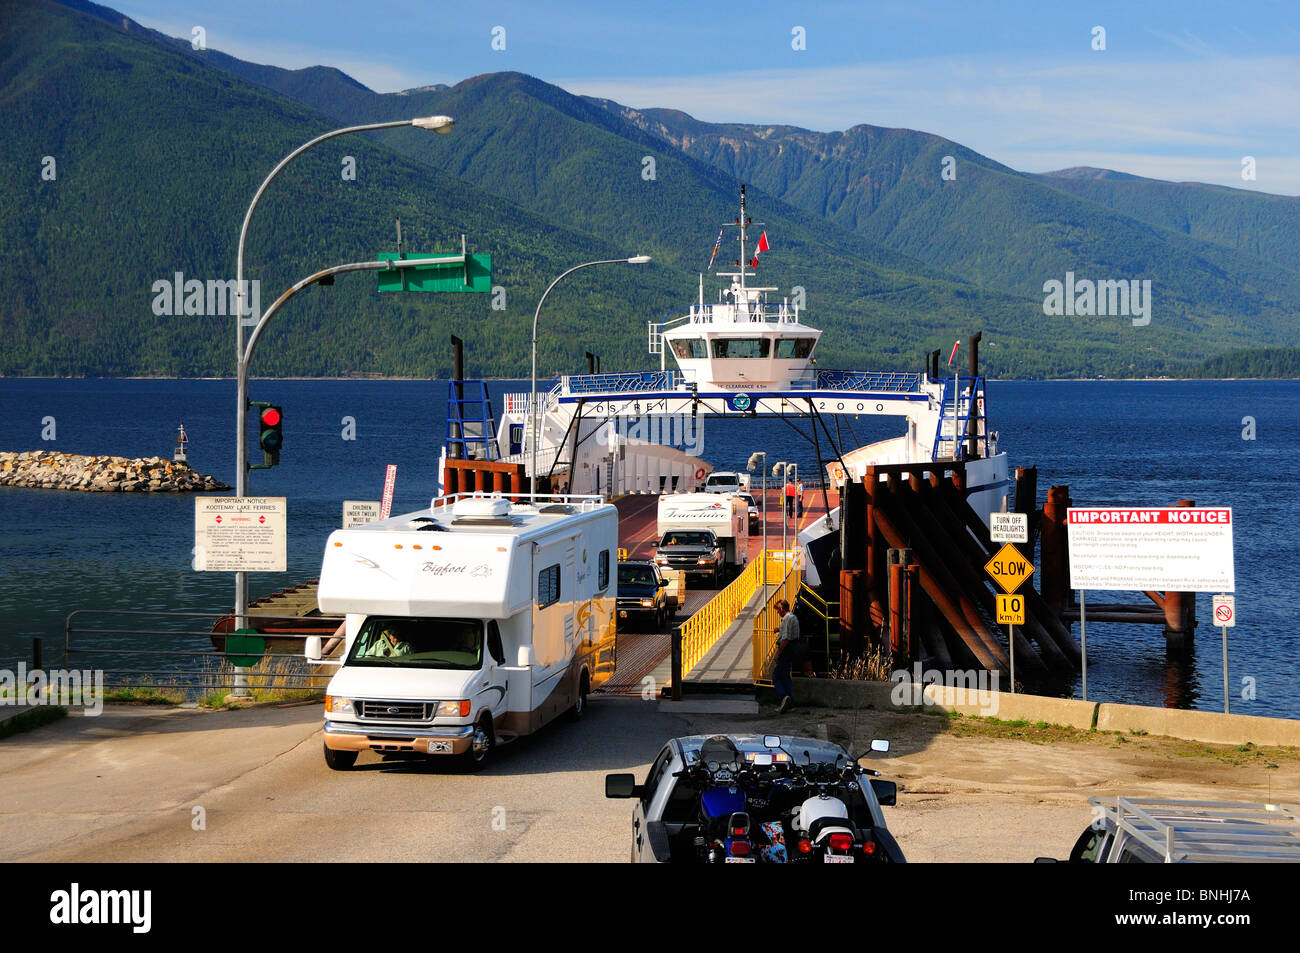 Canada Kootenay Bay Ferry Kootenay Lake Crawford Bay British Columbia Rocky mountains Rockies ship boat cars traffic - Stock Image